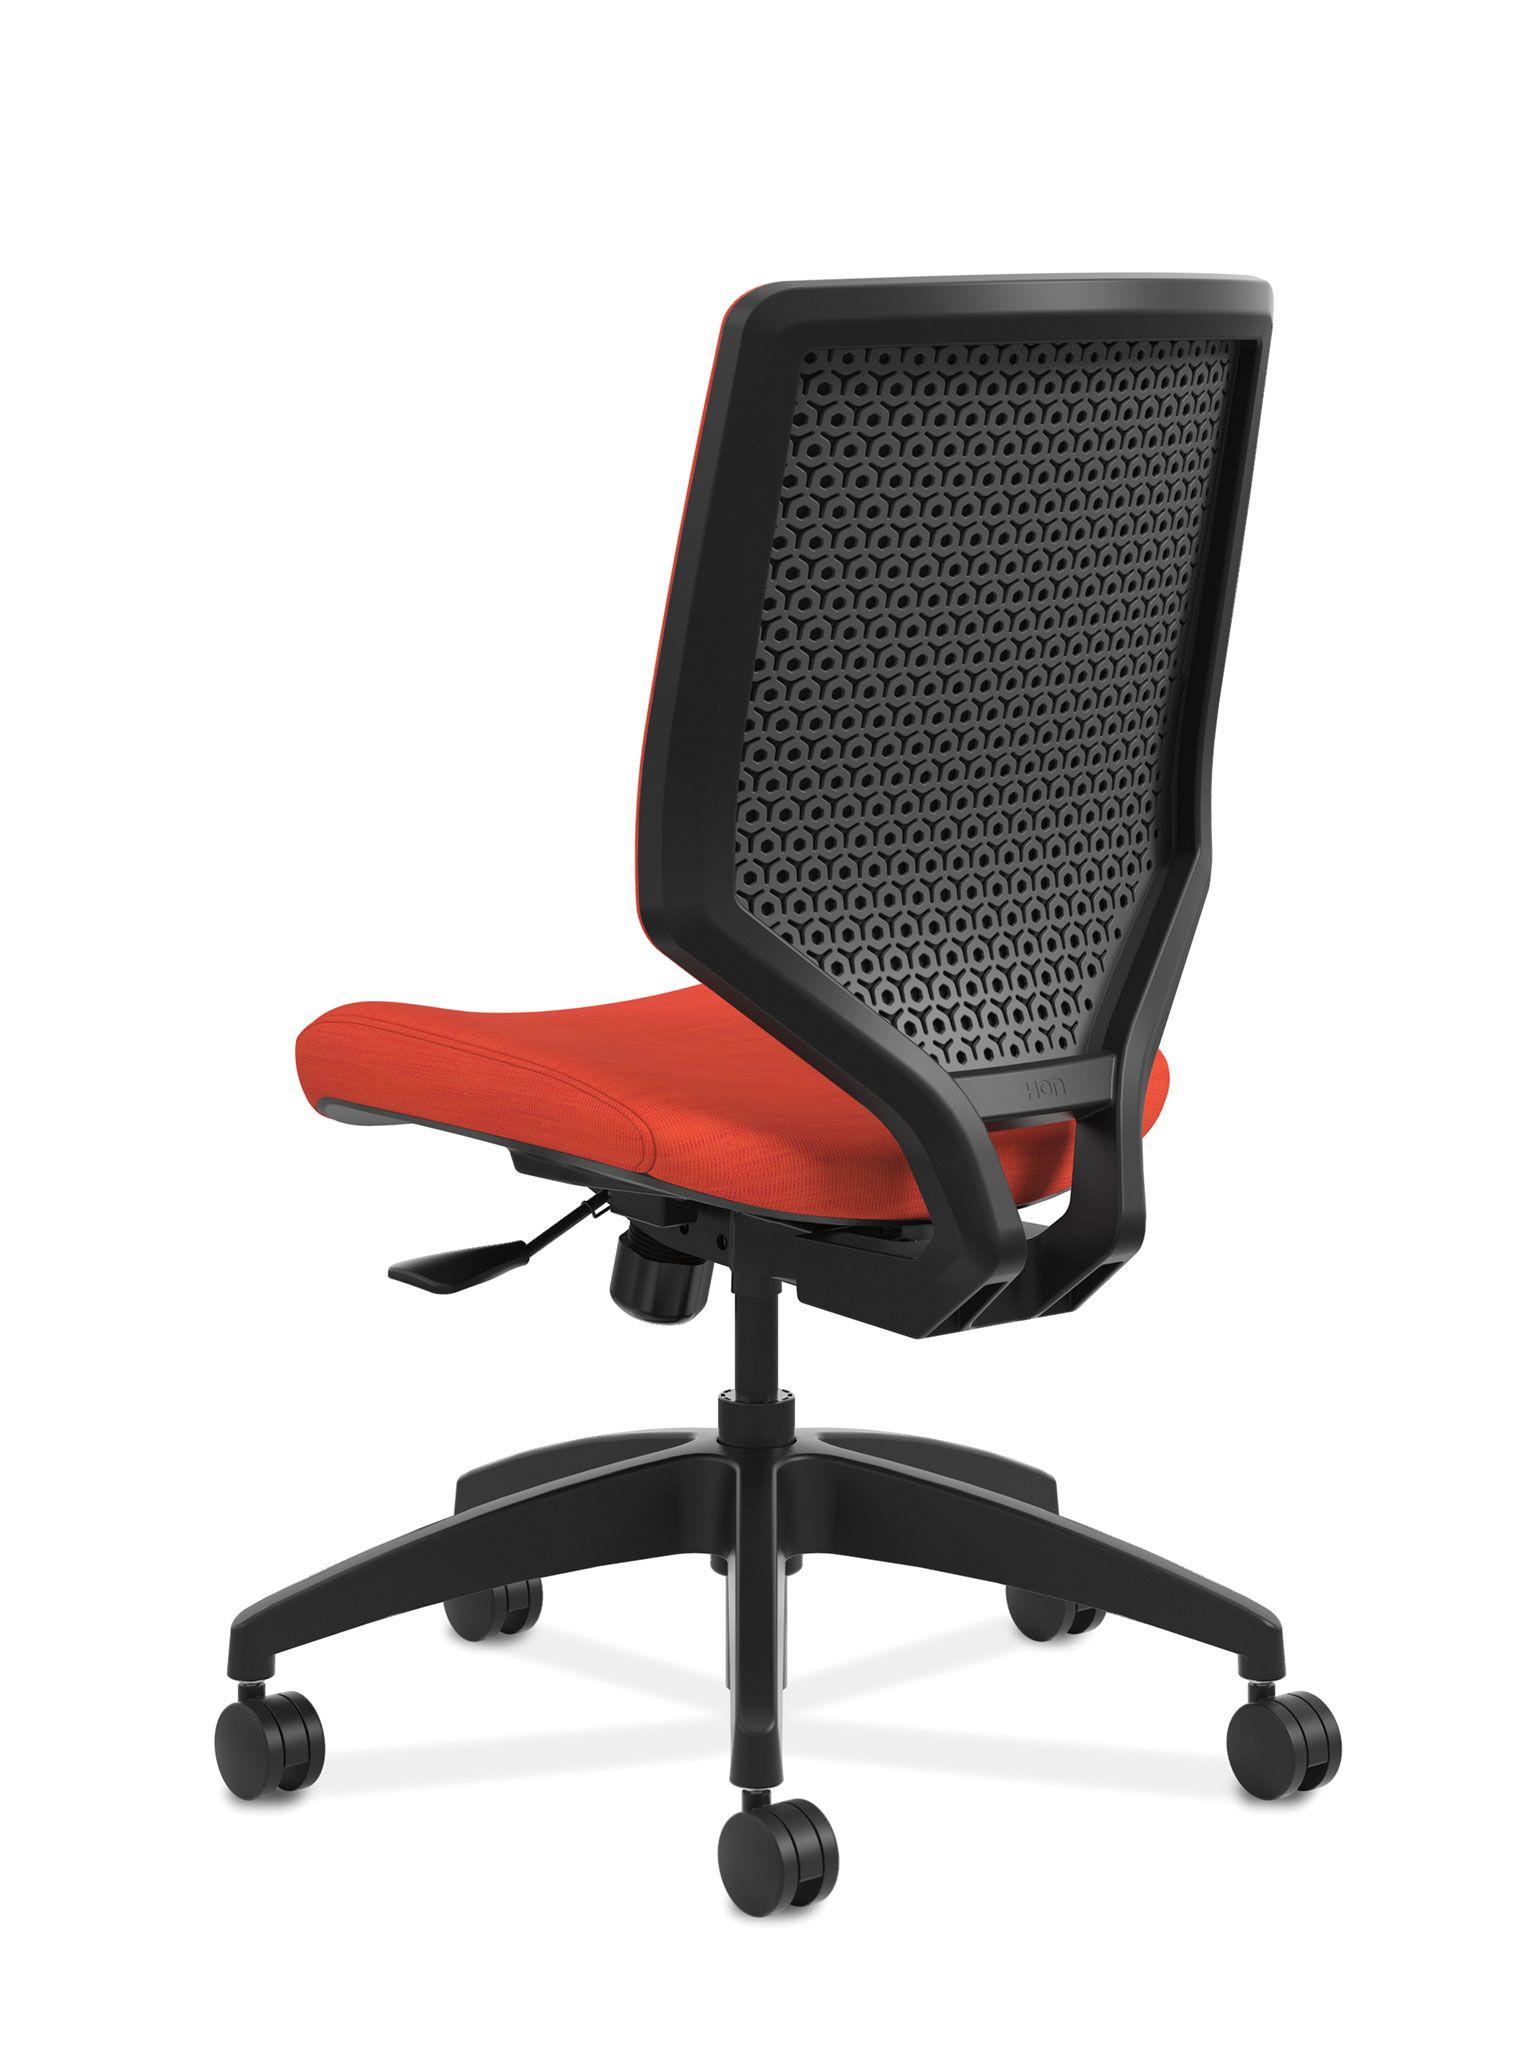 HON Solve Seating via TVOI Chairs & Stools Pinterest